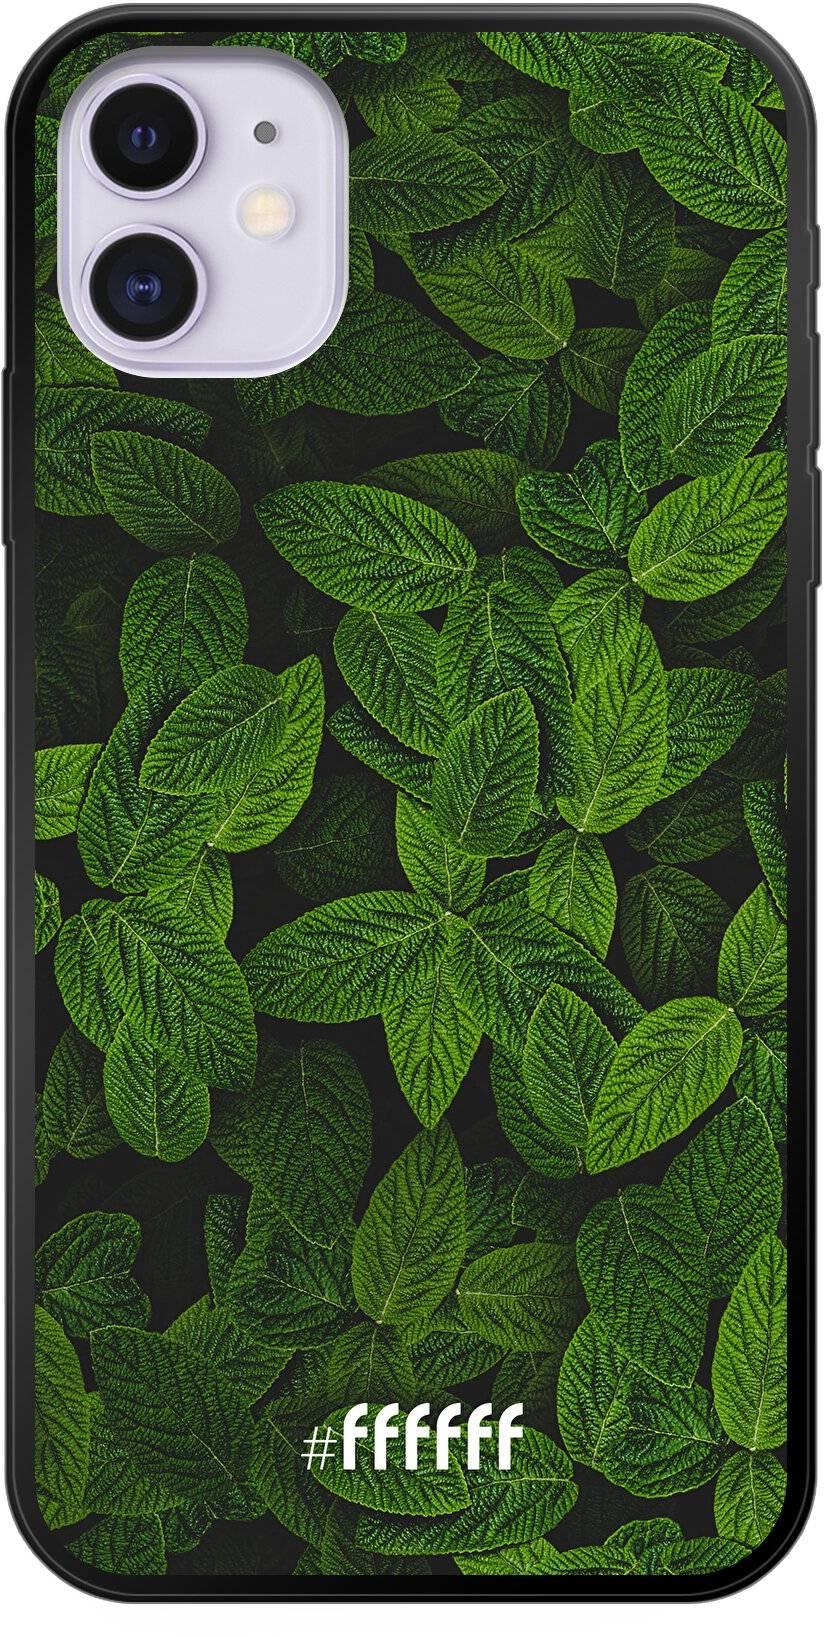 Jungle Greens iPhone 11